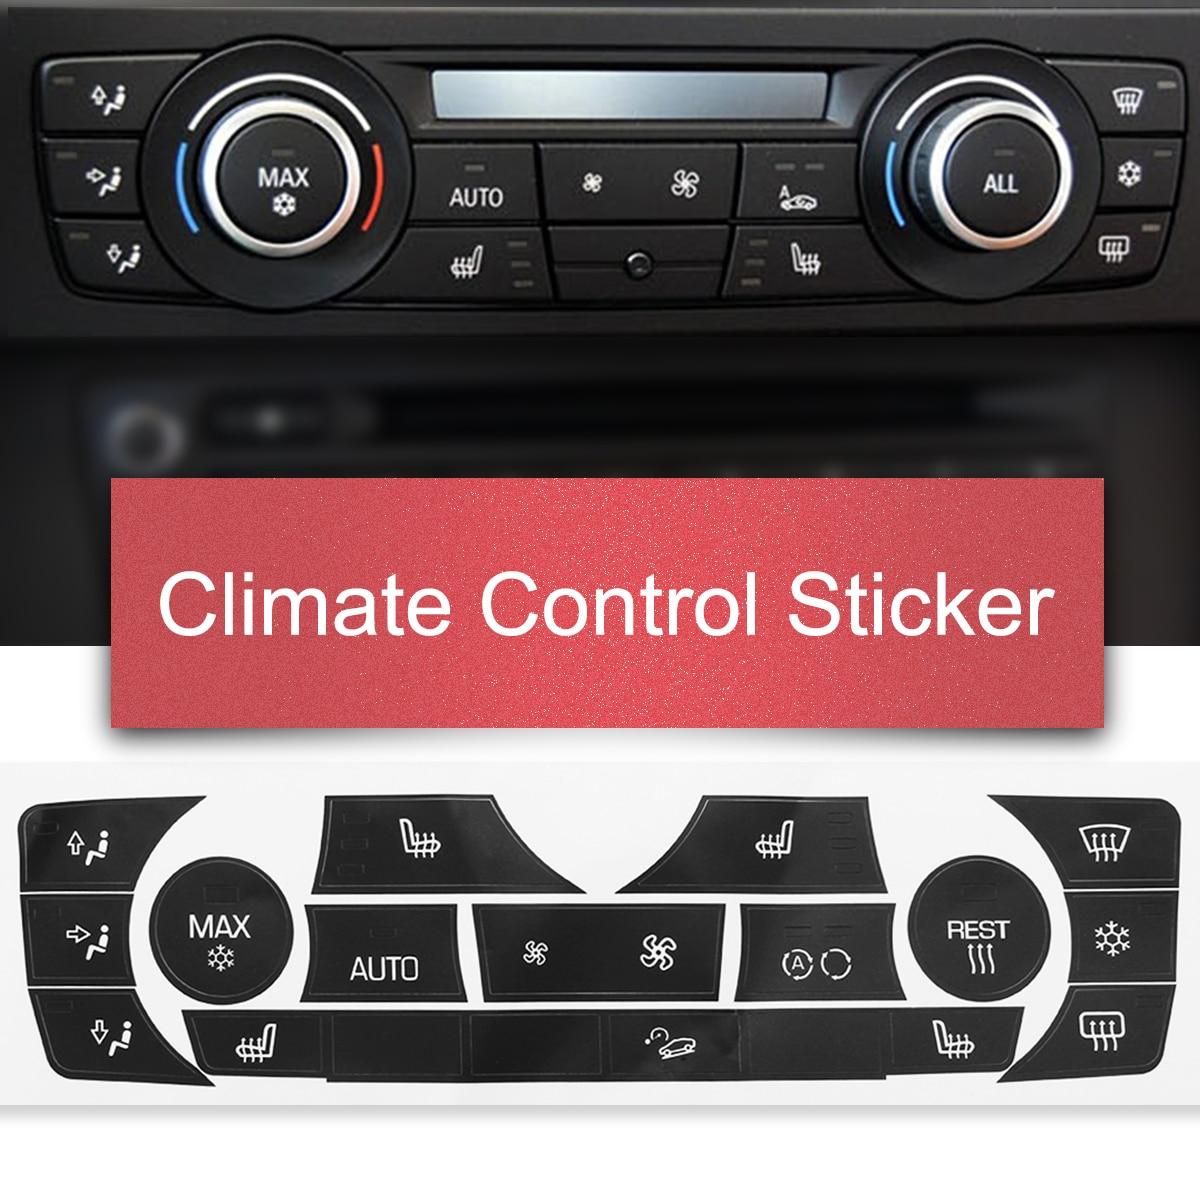 1 unidad de pegatina de botón de Control de clima AC Kit de pegatina de reparación de botón de Panel para BMW E90 E91 E92 330I 06-11 tipo Regular